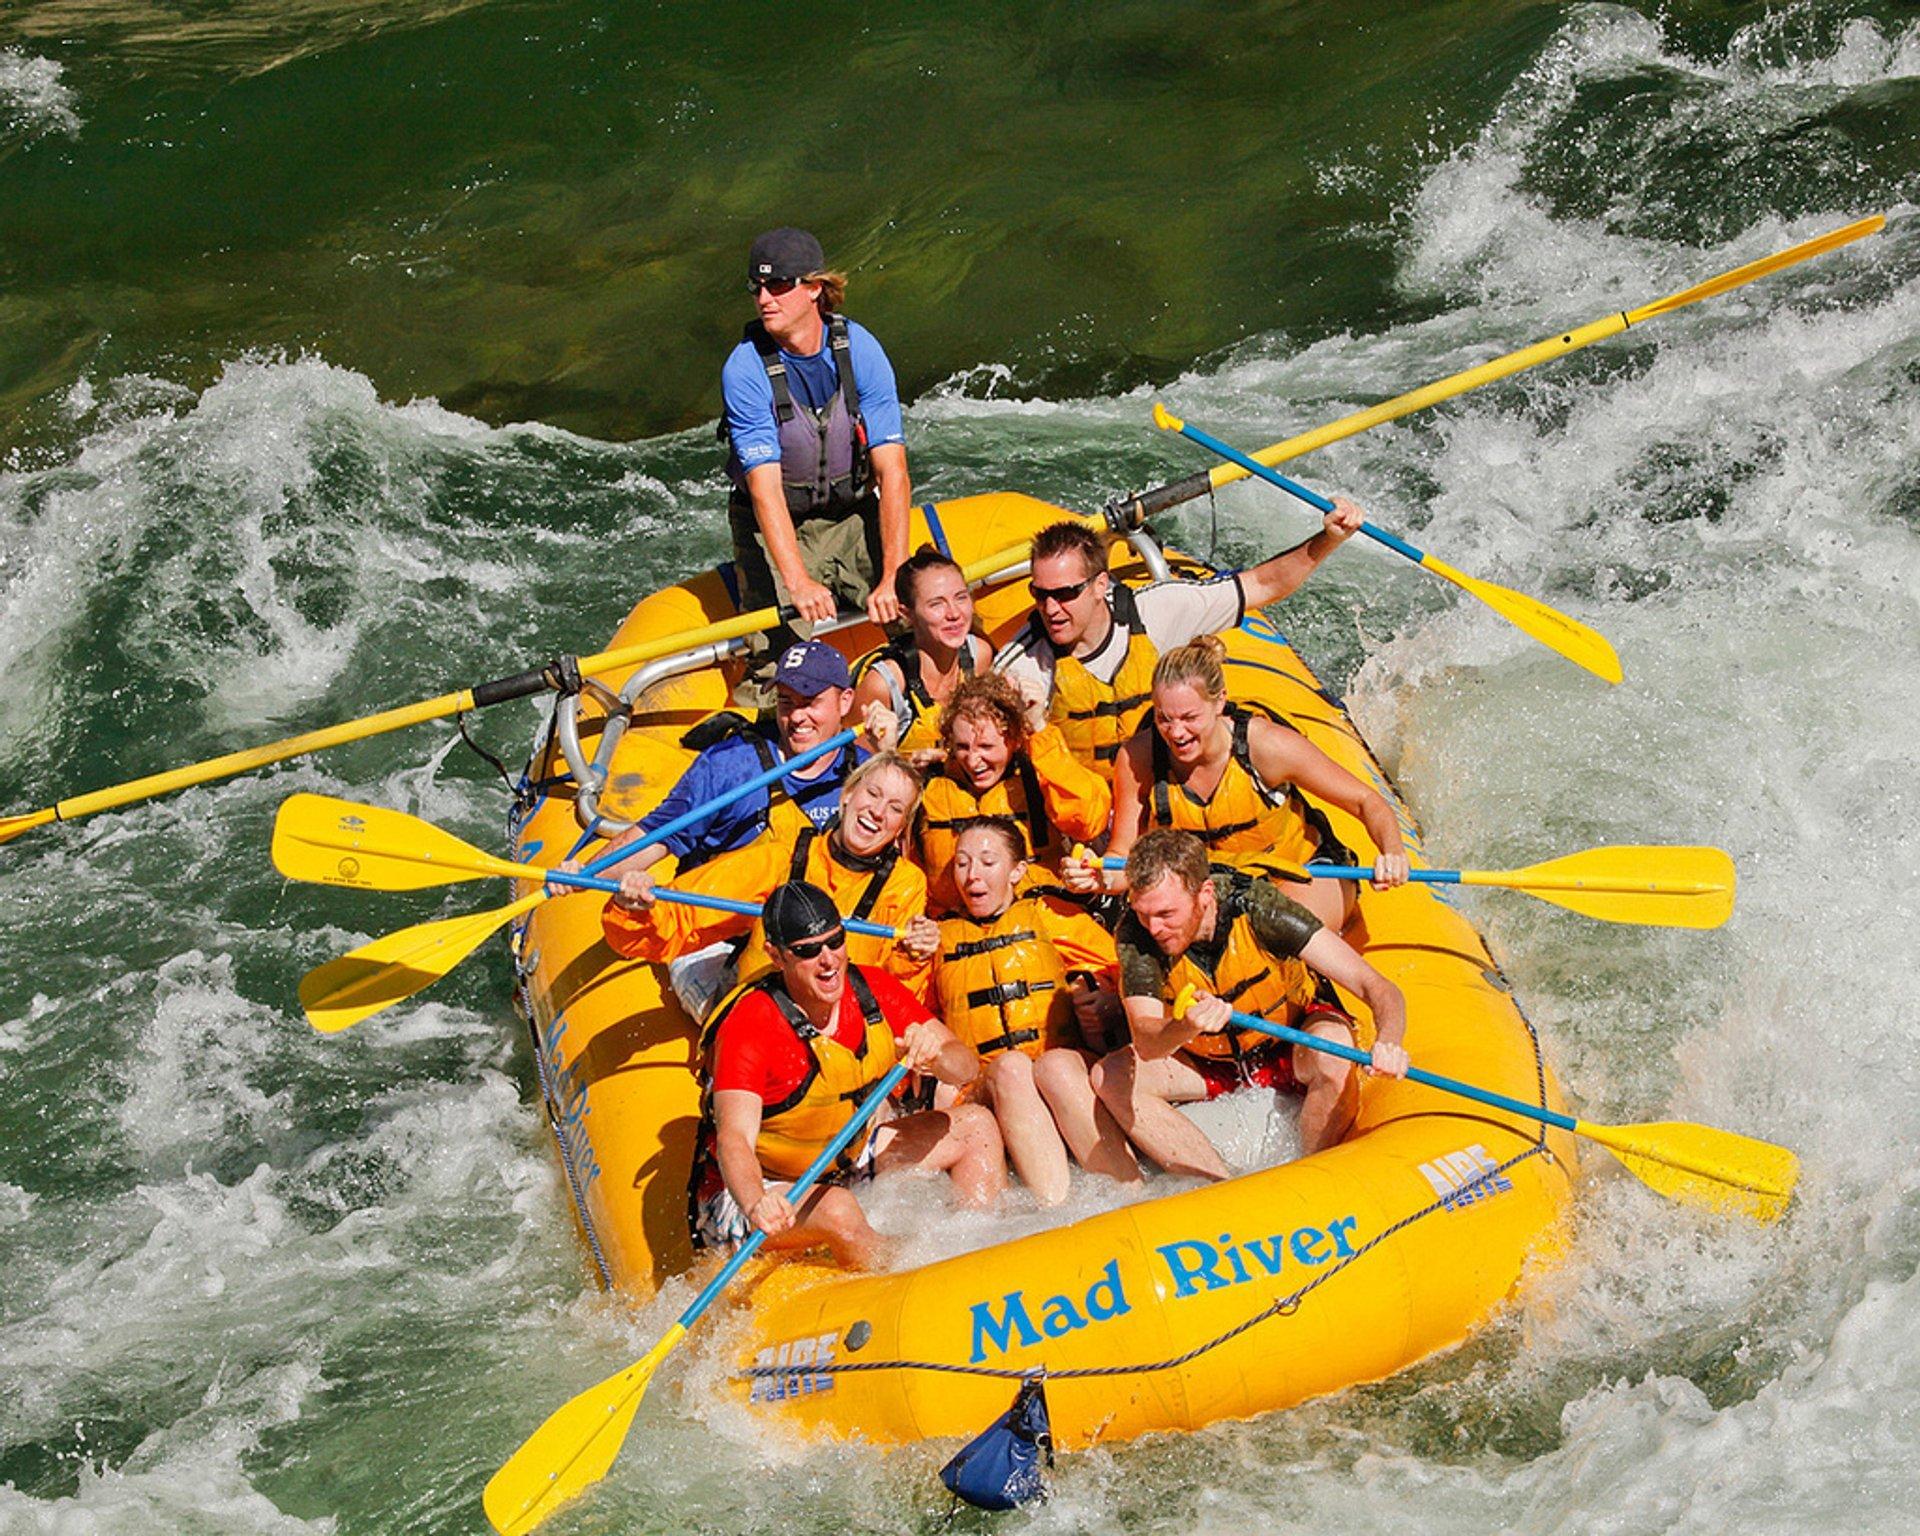 Rafting in Yellowstone National Park - Best Season 2020